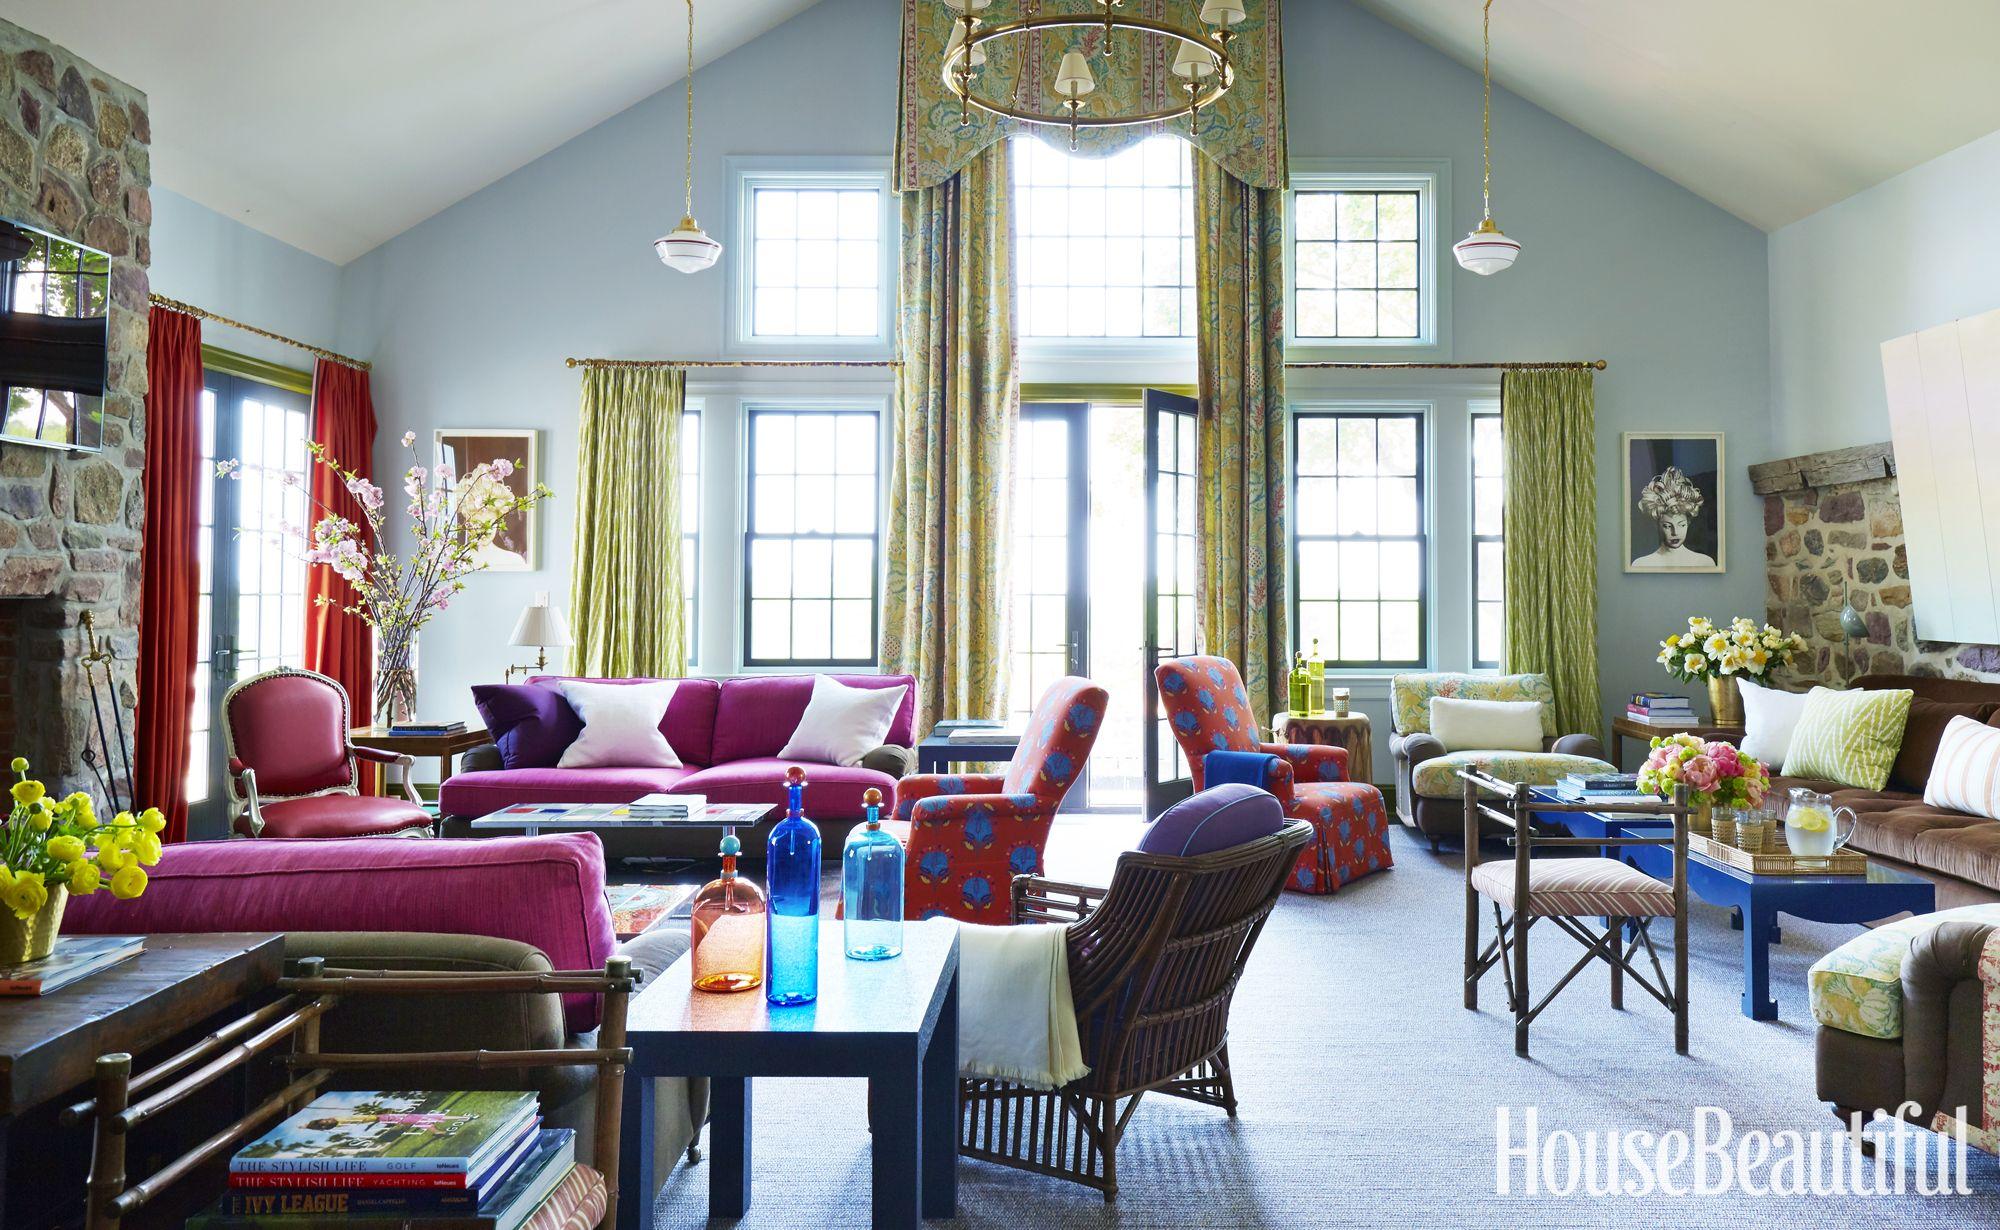 145+ Best Living Room Decorating Ideas & Designs - HouseBeautiful.com